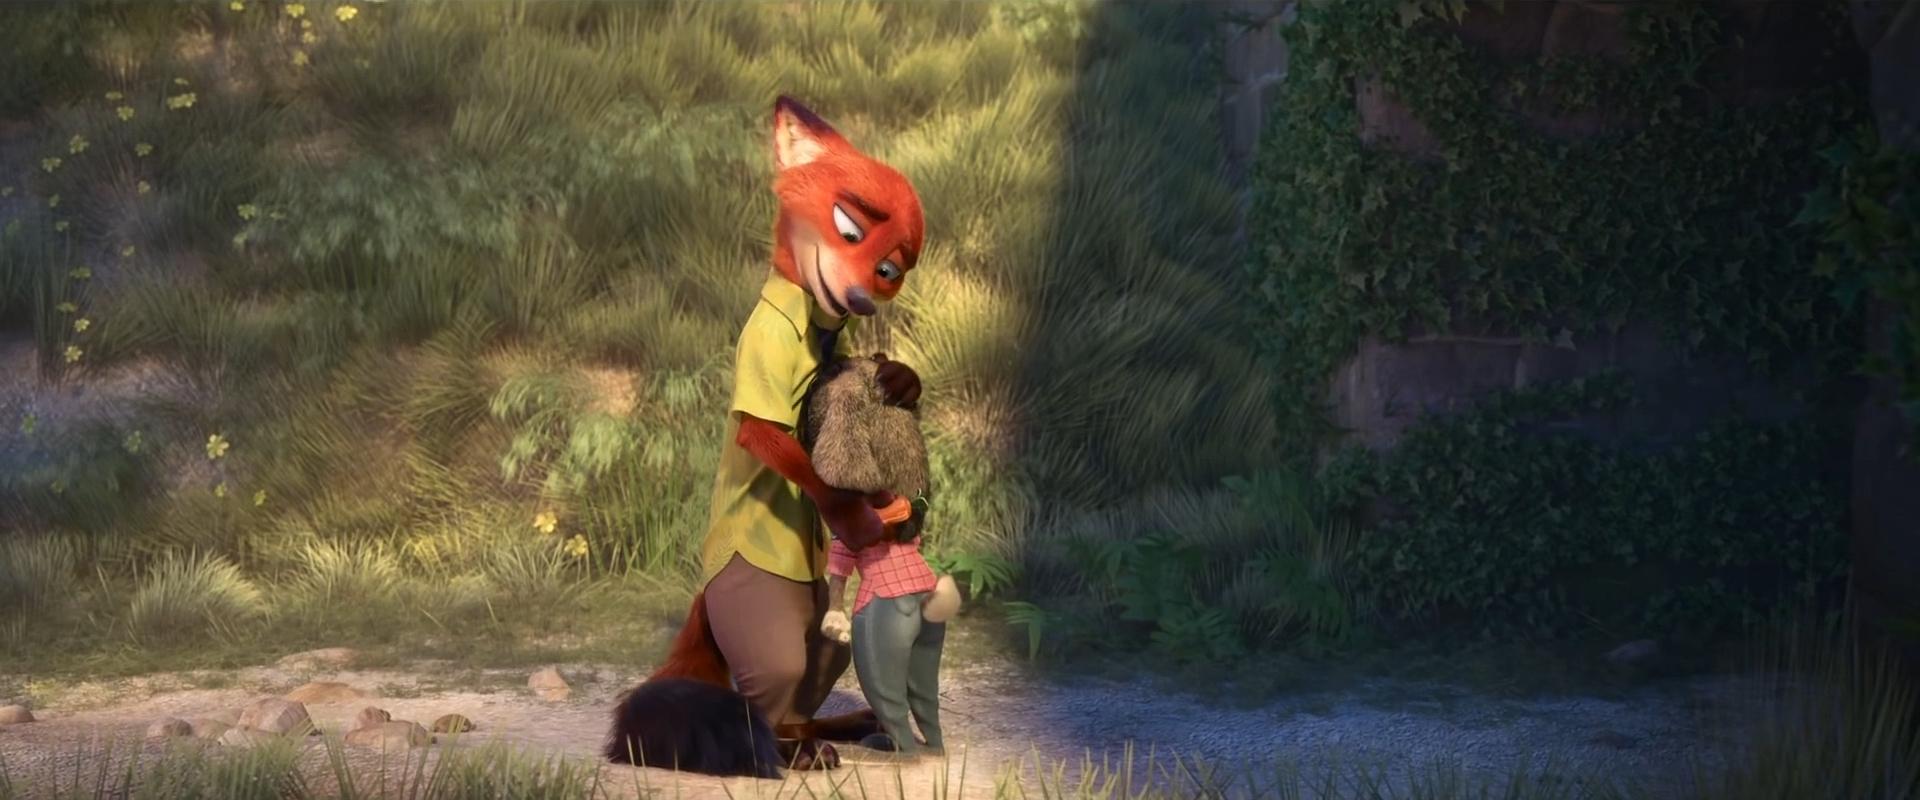 Disney Zootropolis//Zootopia MINI PERSONNAGE FIGURINE-Teeny Tiny Finnick